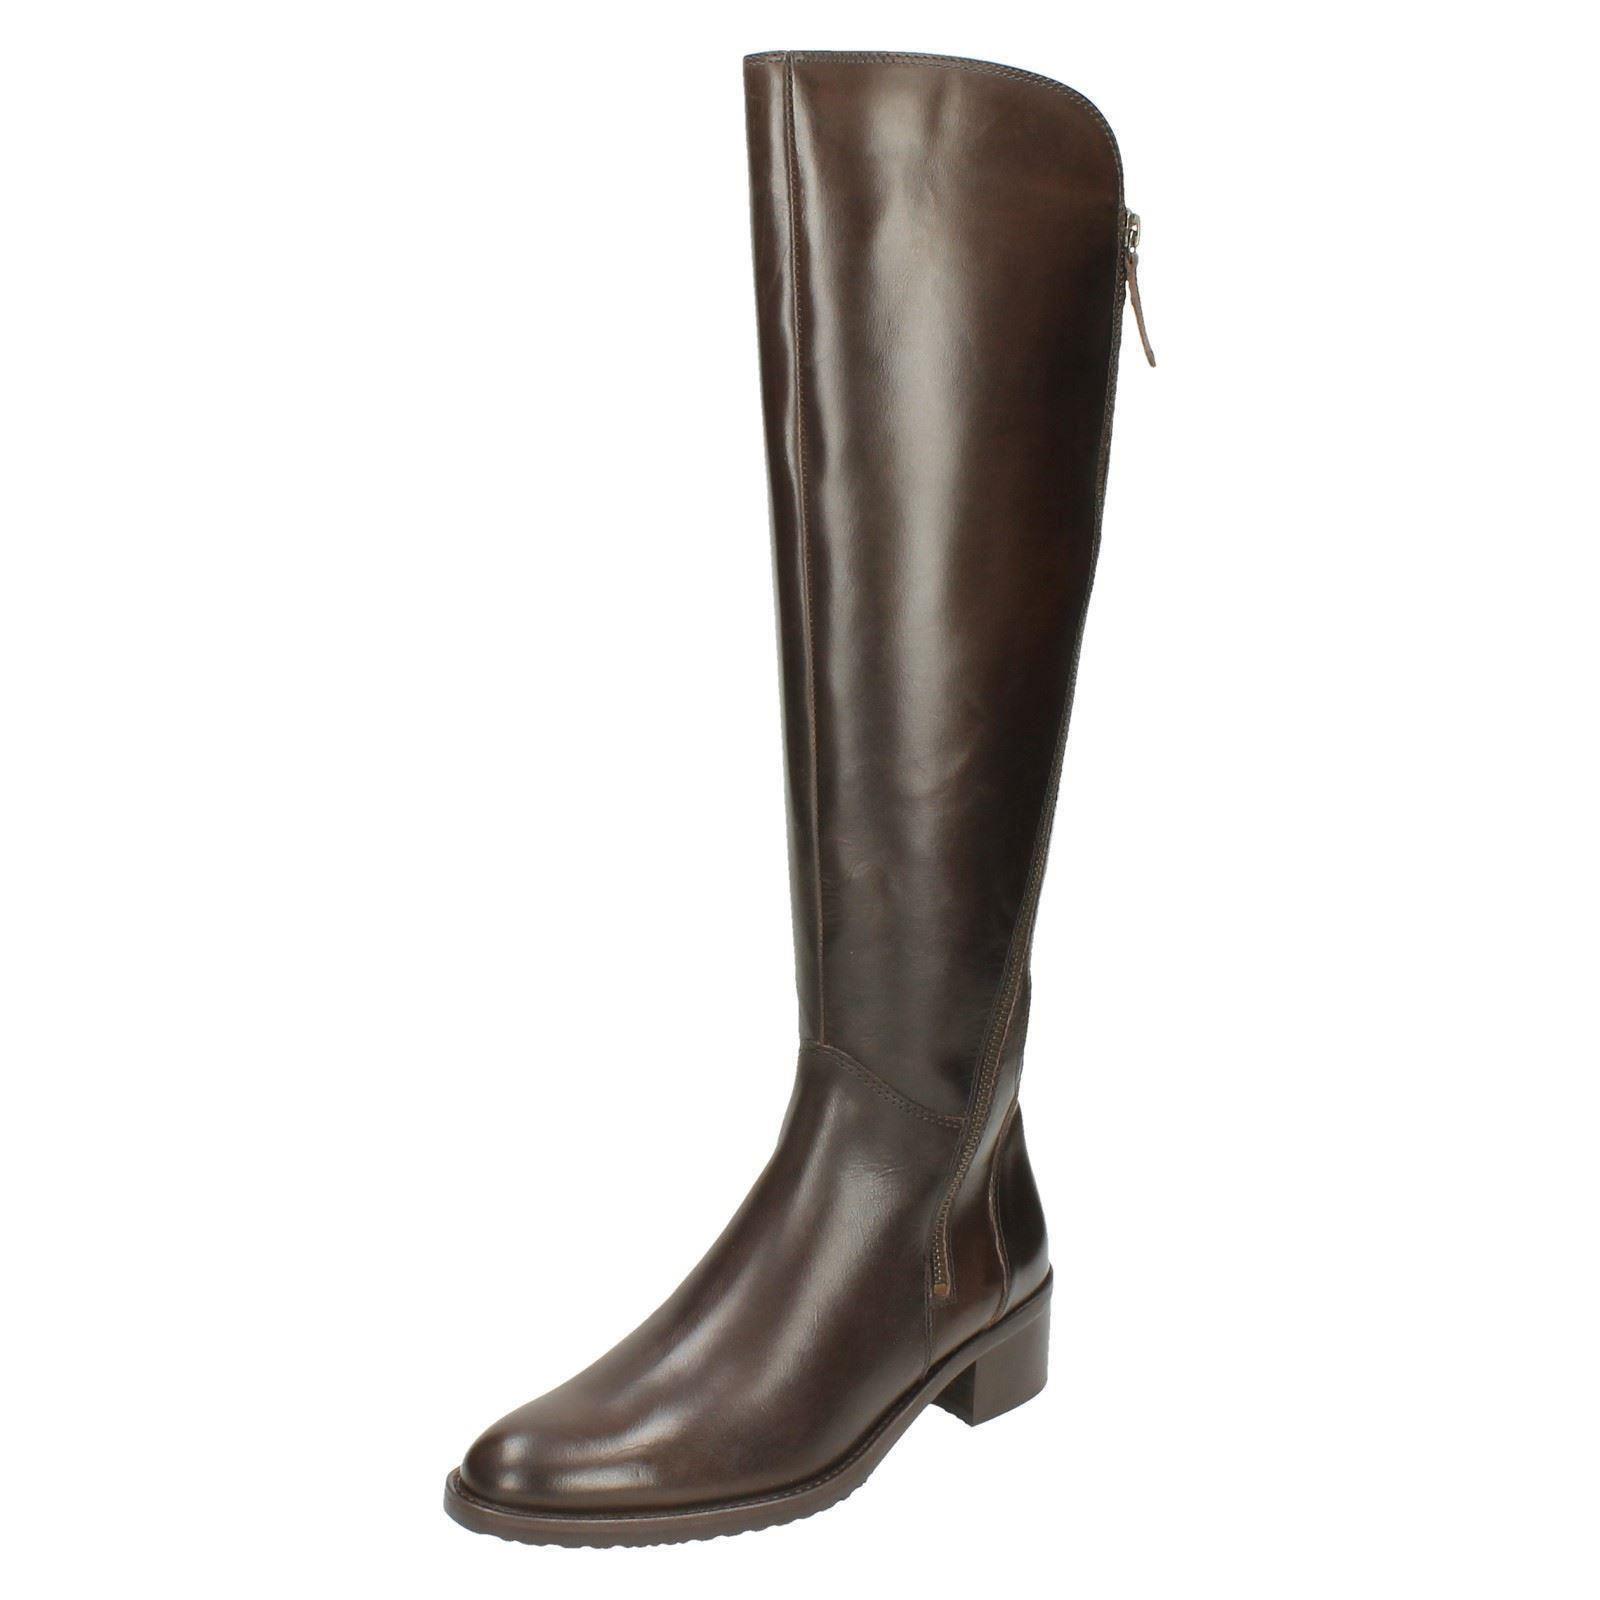 Femmes clarks équitation style bottes longues valana valana valana melrose | Spécial Acheter  53a0e4